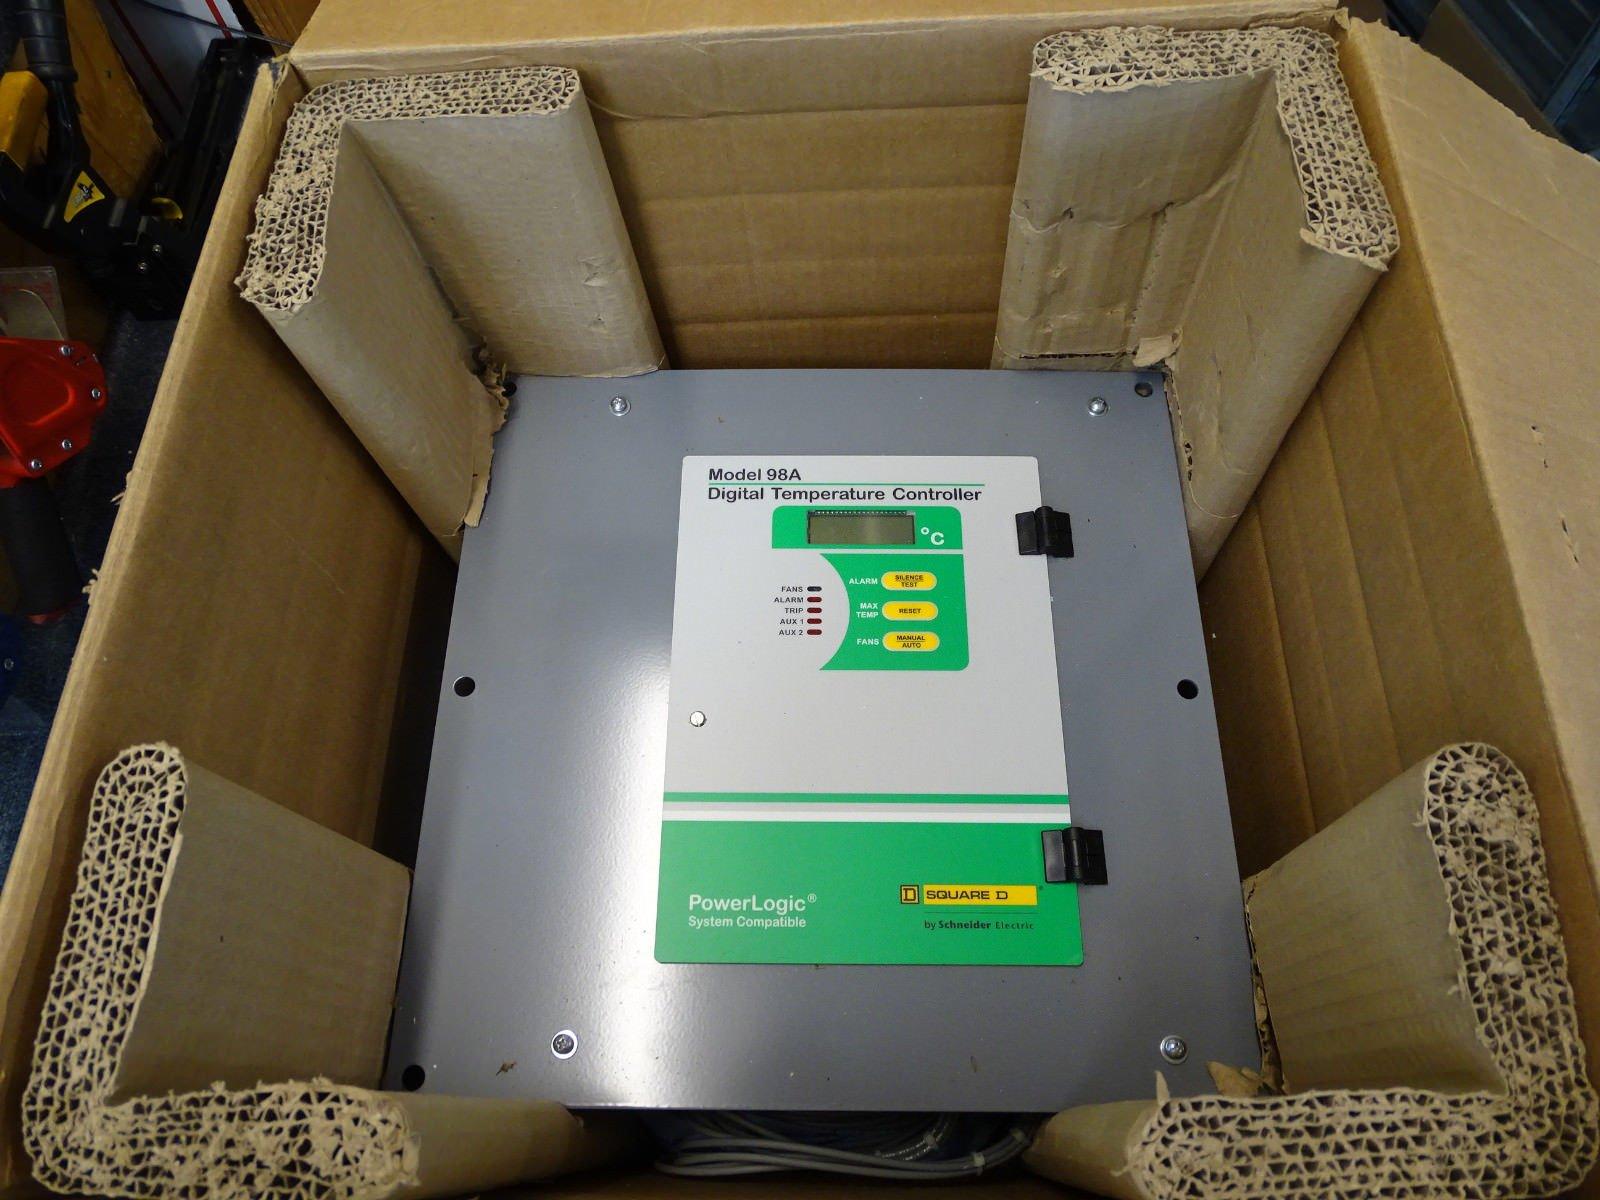 Square D Powerlogic Model 98A Digital Temperature Controller BRAND NEW